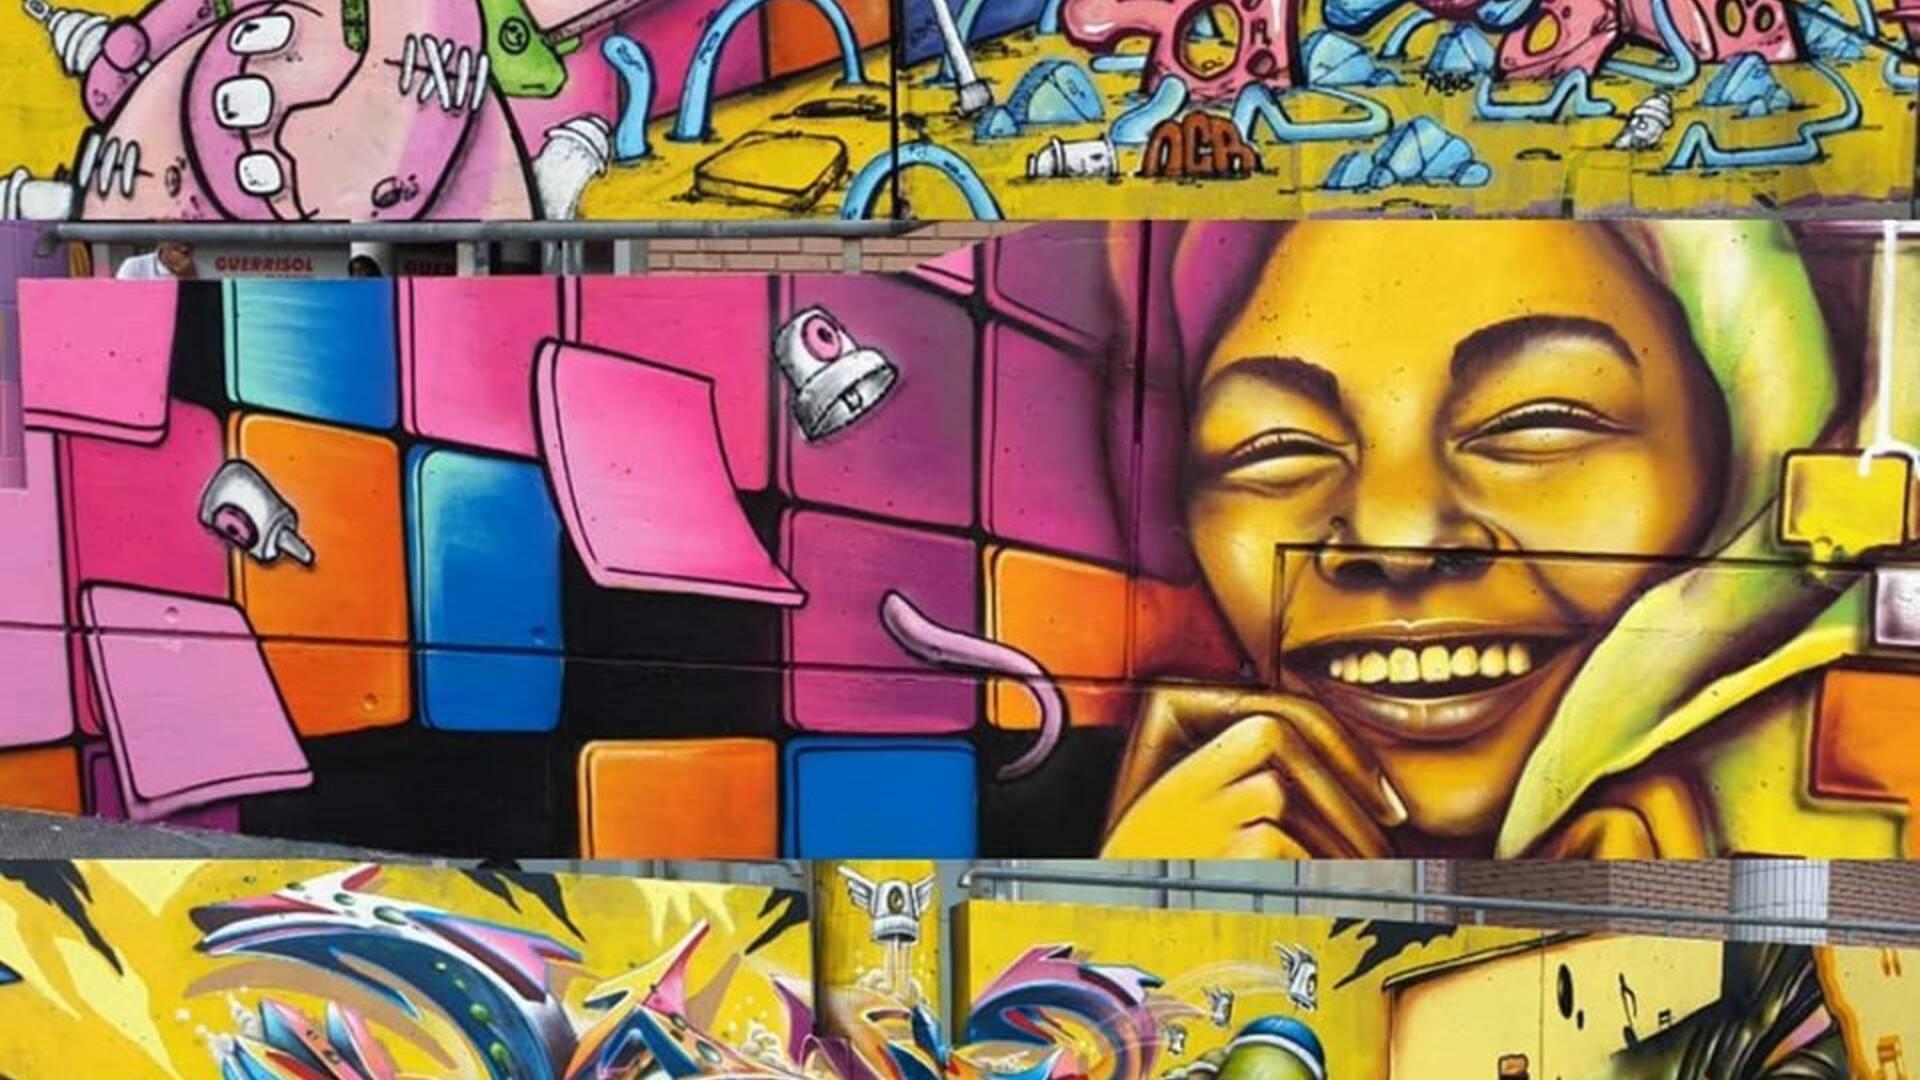 rebus-waf-alosta-graff-rige-bastos-mur-93-street-art-art-urbain